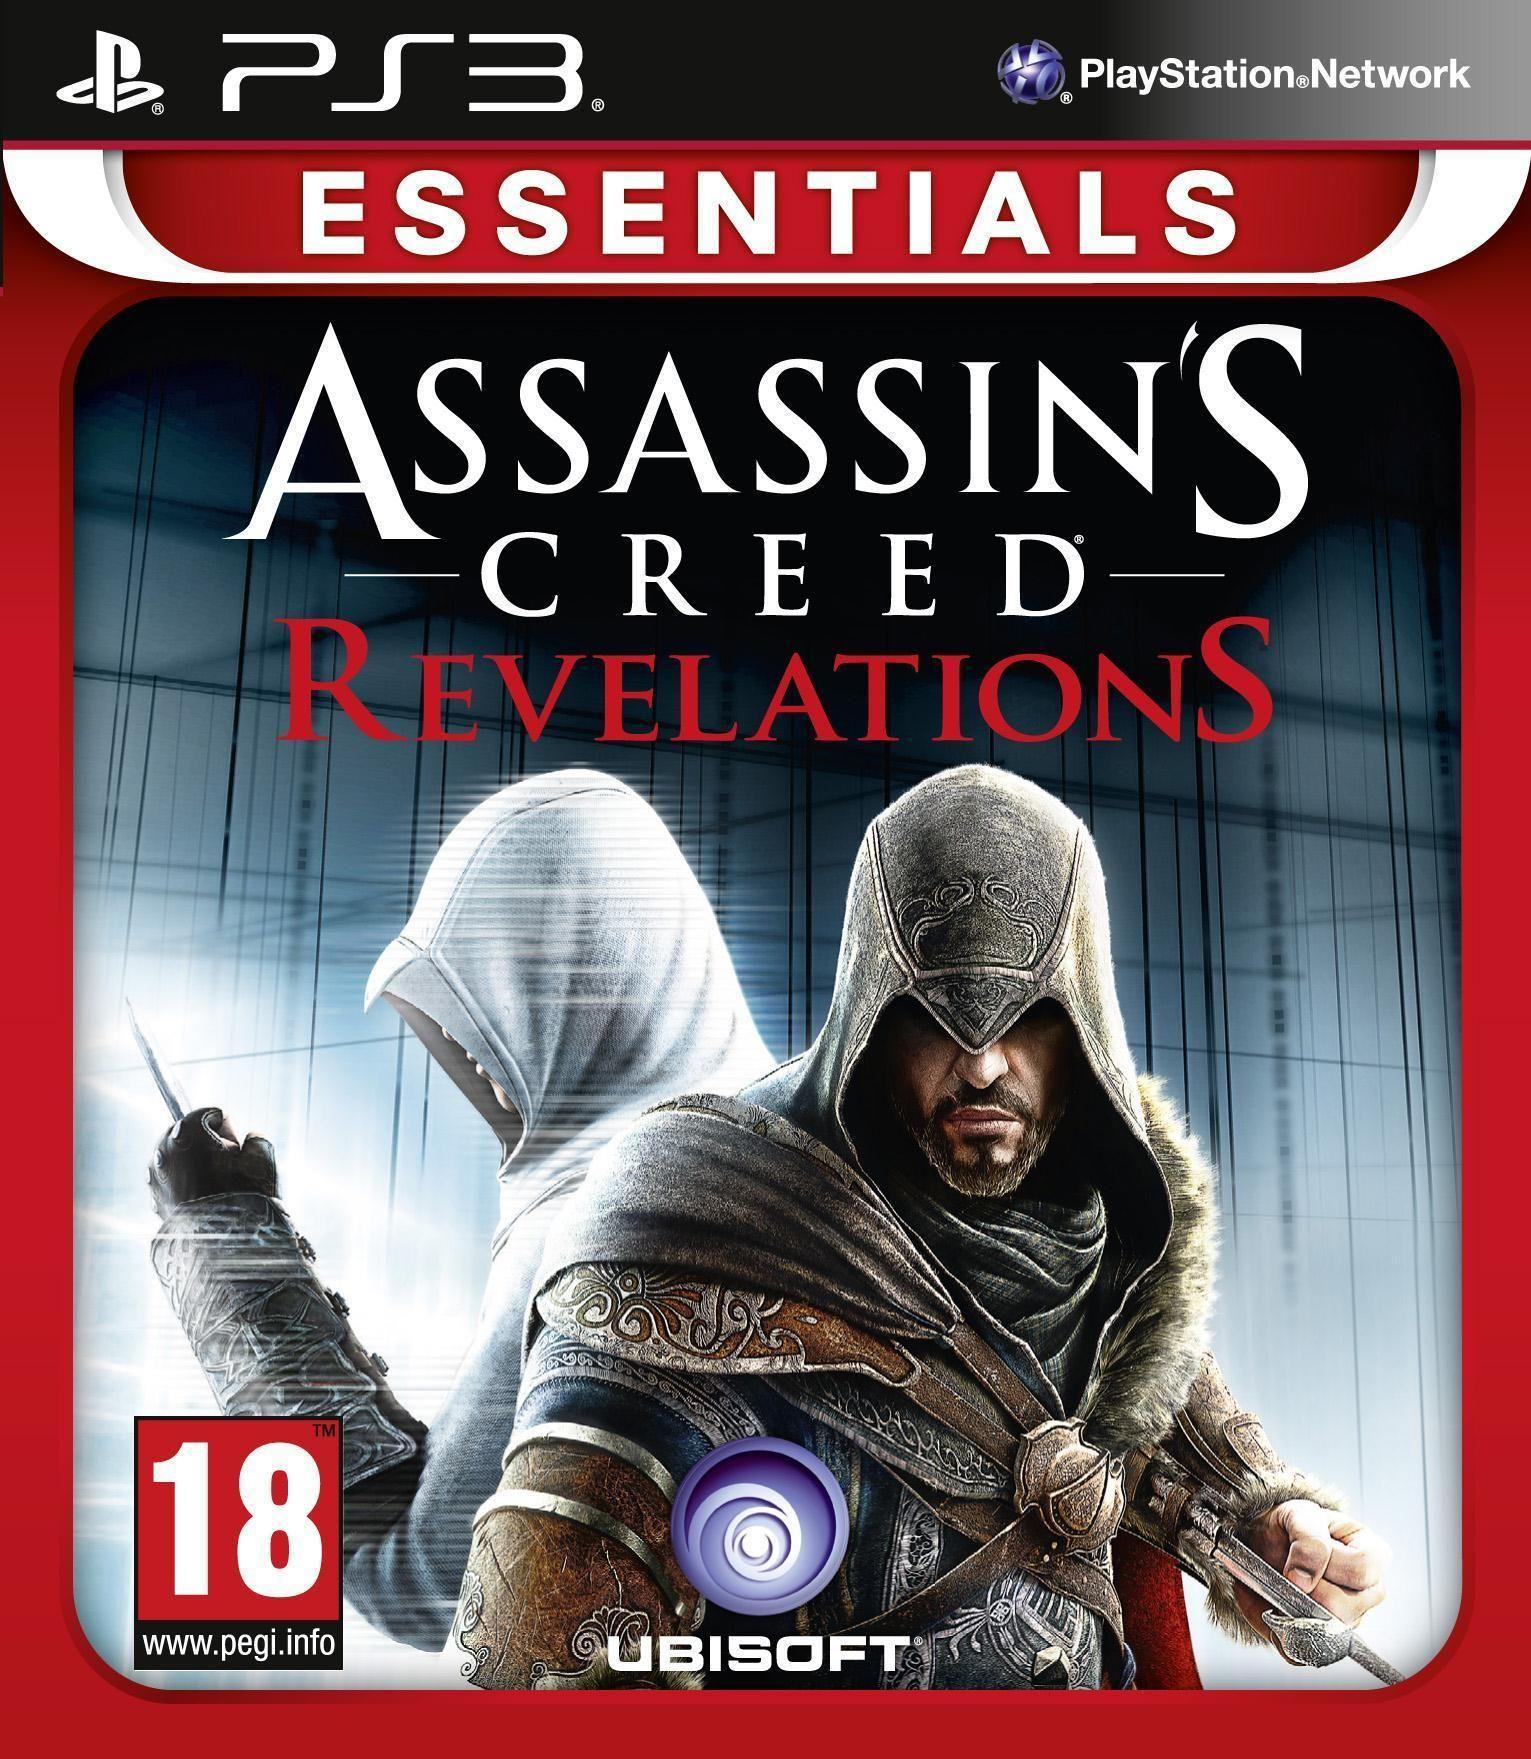 Assassins Creed: Revelations PS3